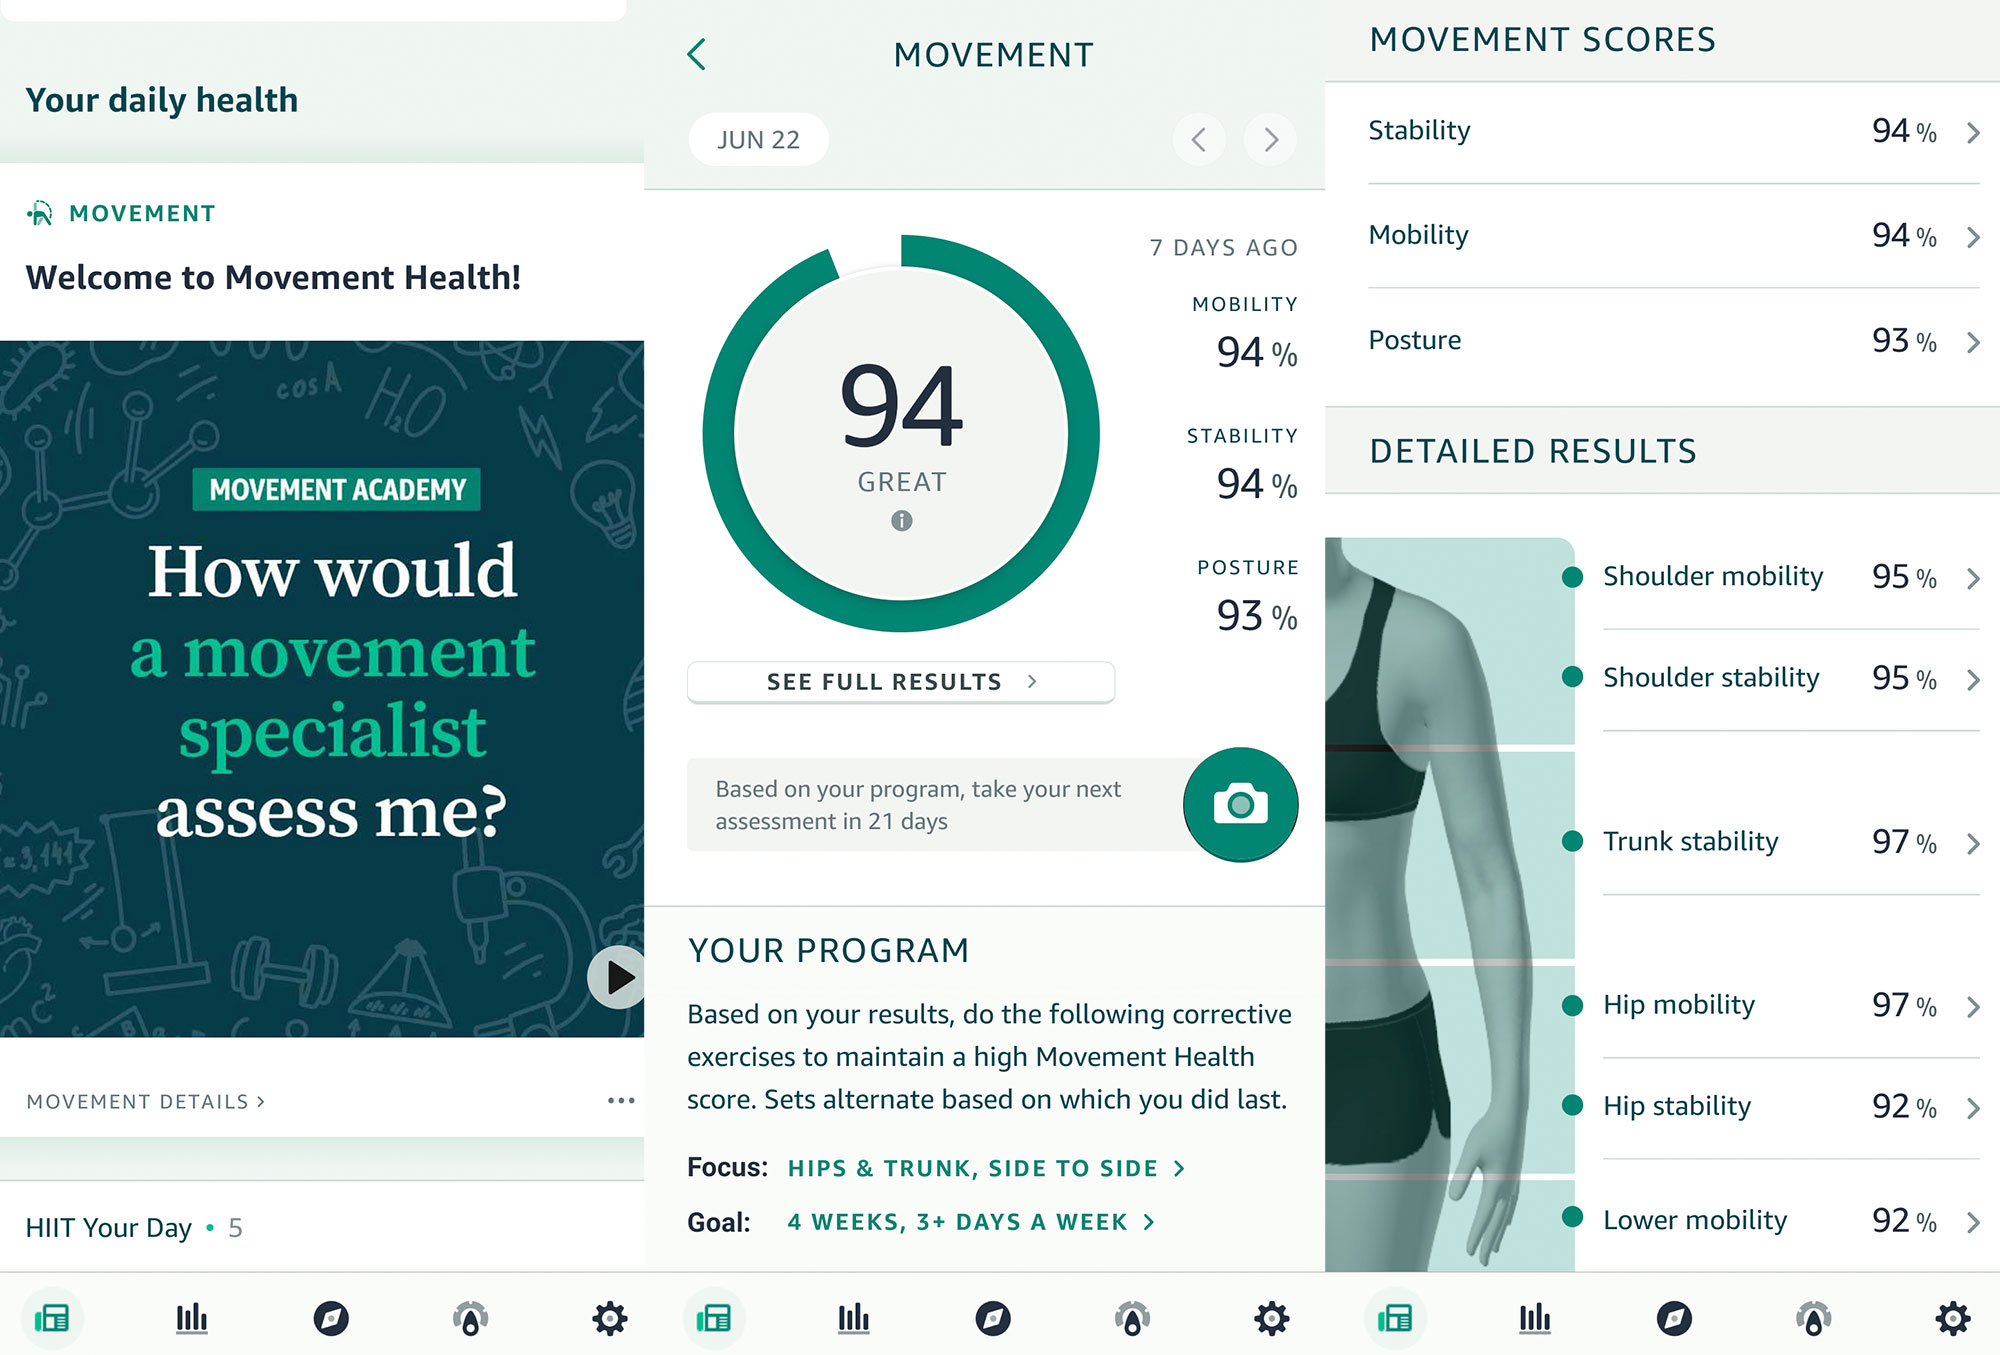 Amazon Halo Movement Health app screenshots